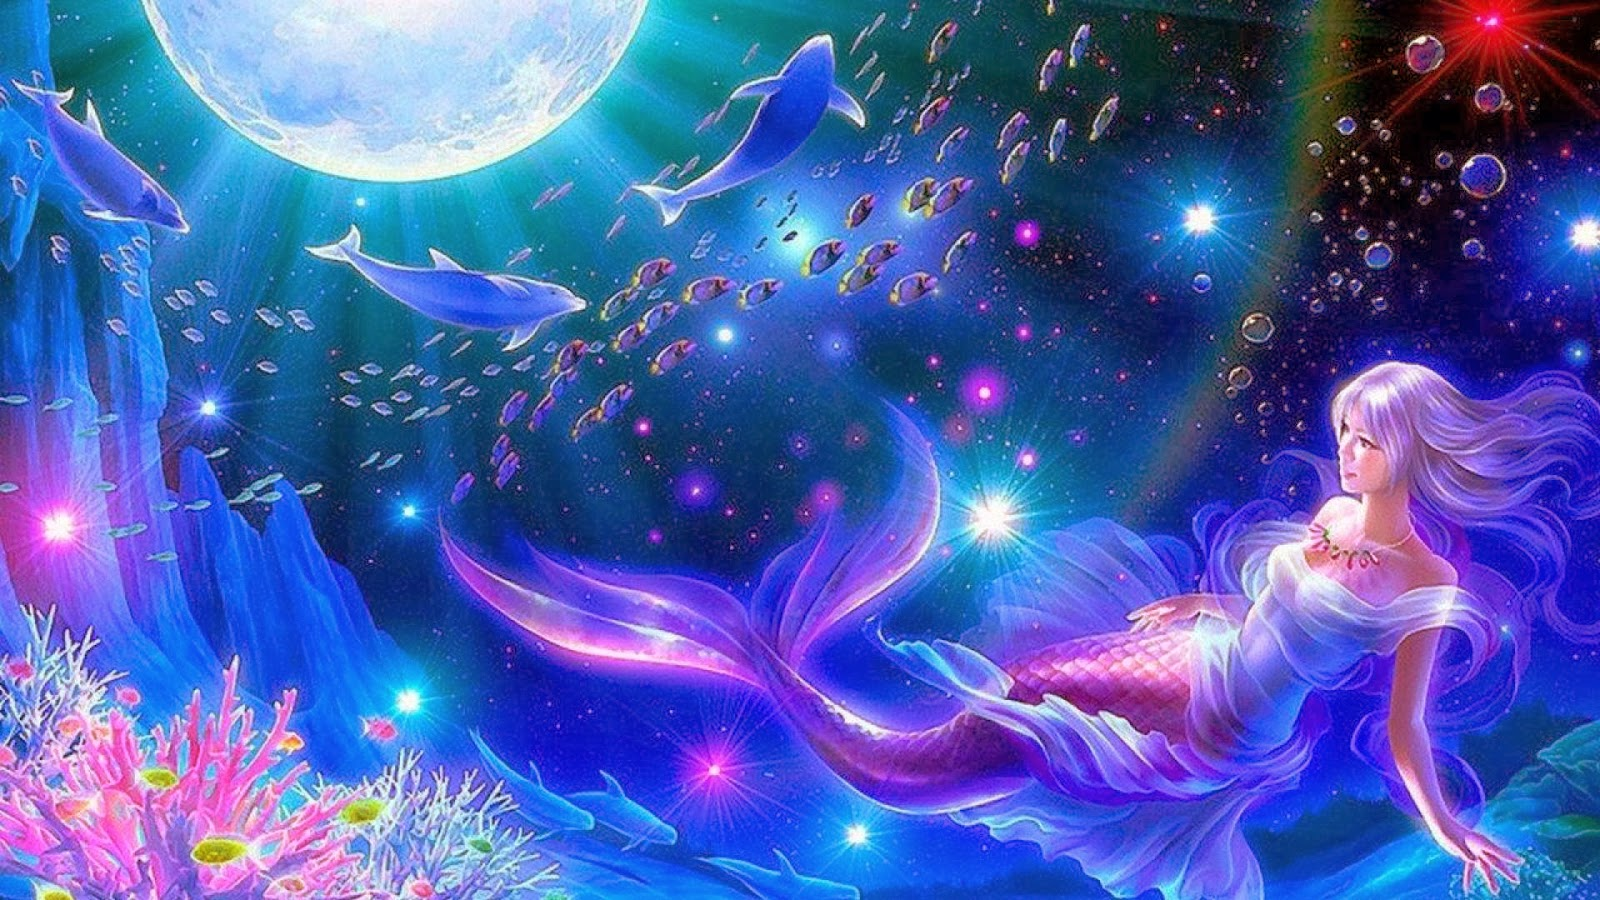 All new wallpaper Mermaid moon fantasy widescreen hd wallpaper 1600x900